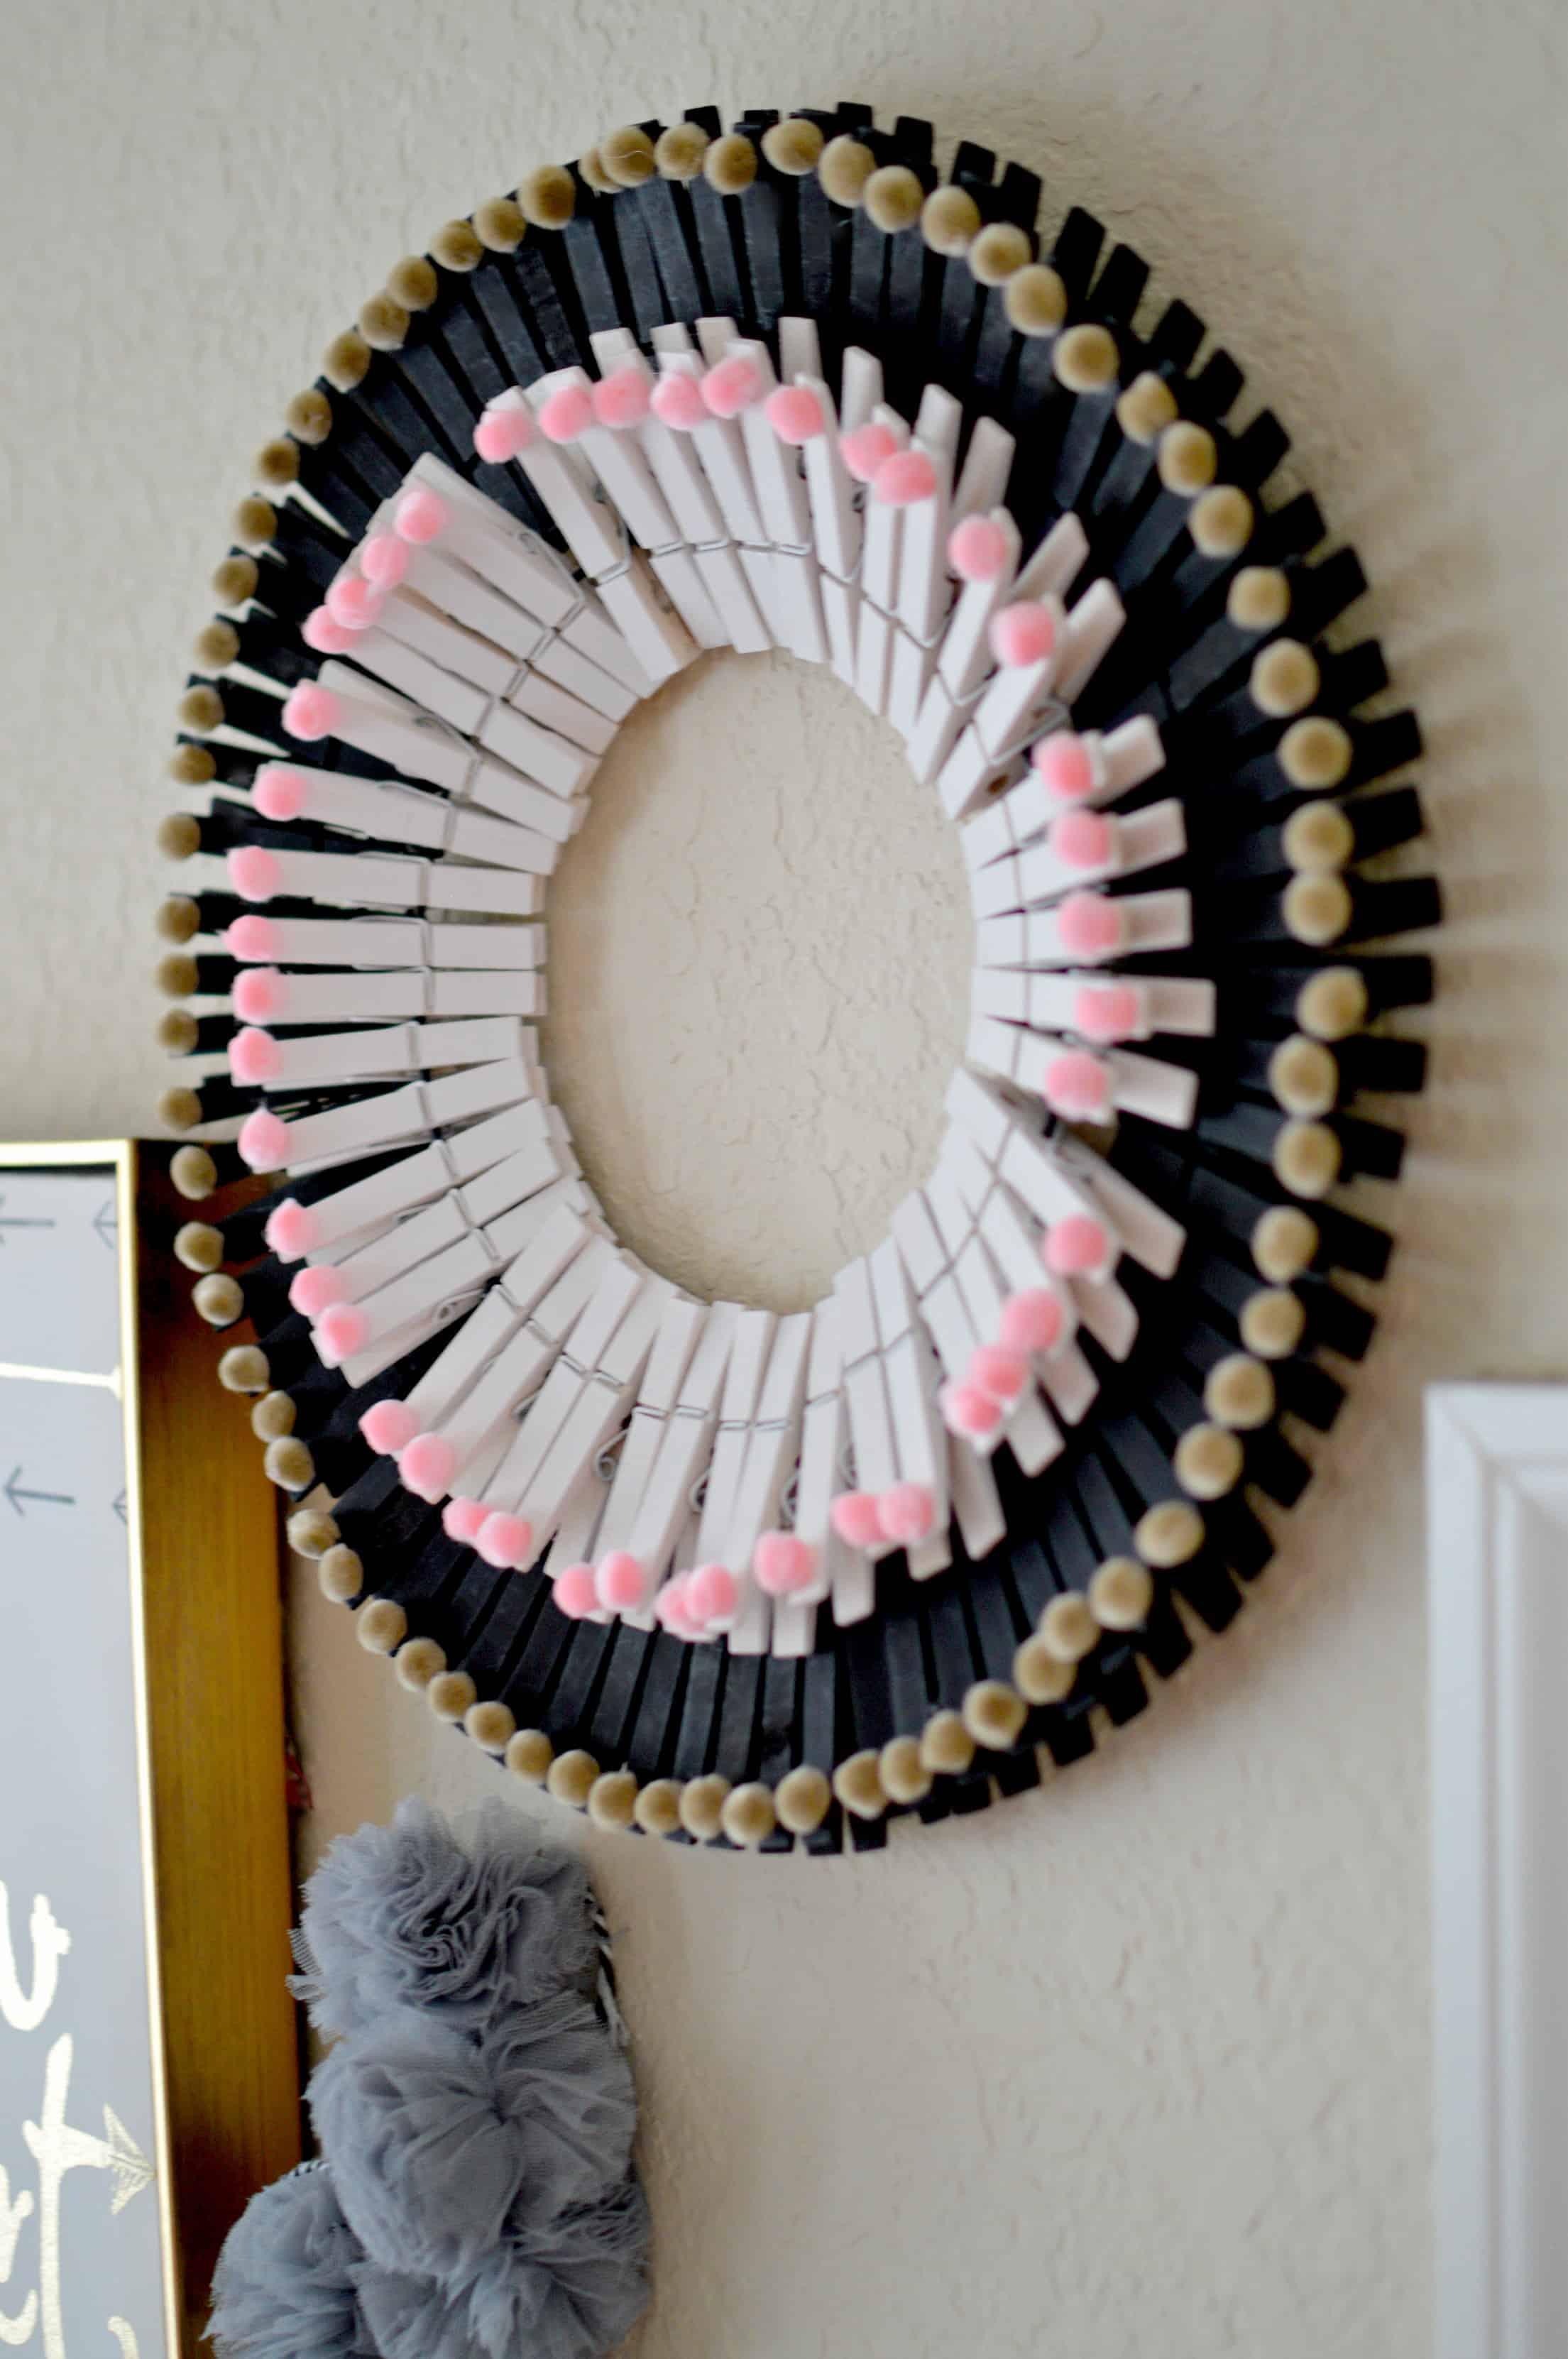 DIY Pom Pom Clothespin Wreath